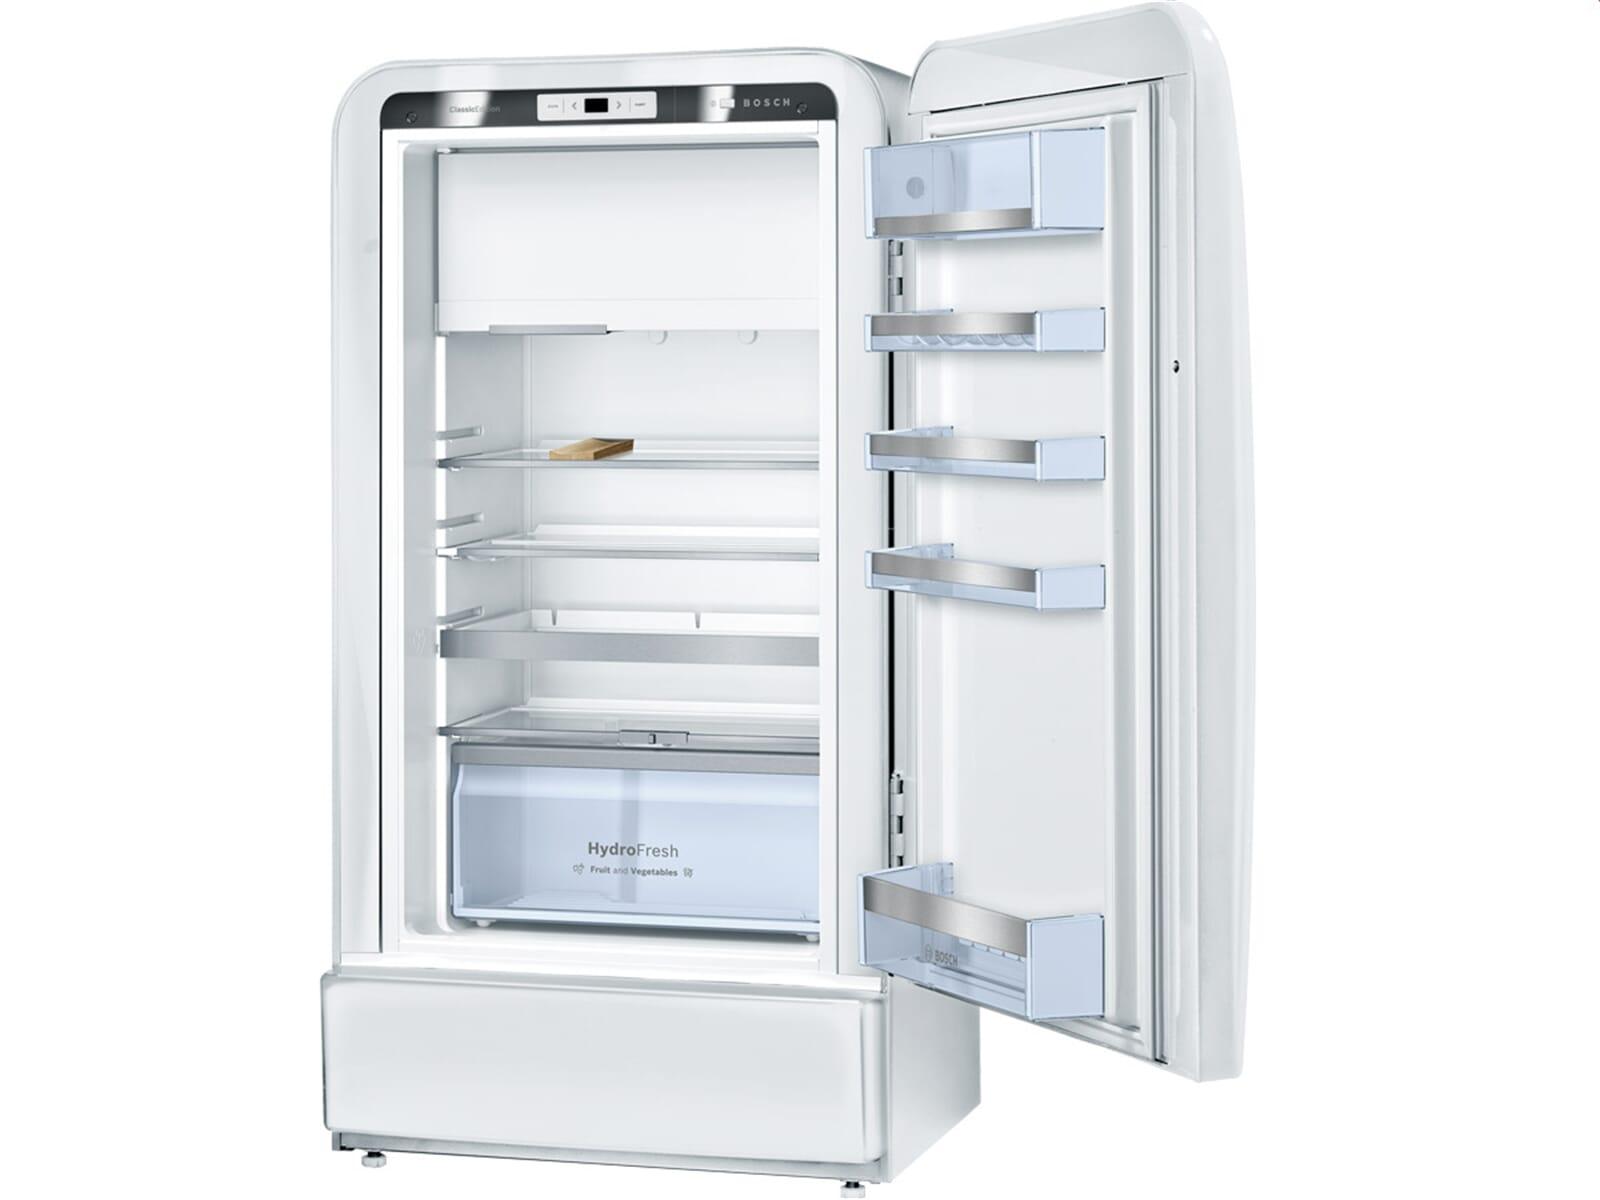 Bosch Kühlschrank Weiß : Bosch ksl aw standkühlschrank weiß